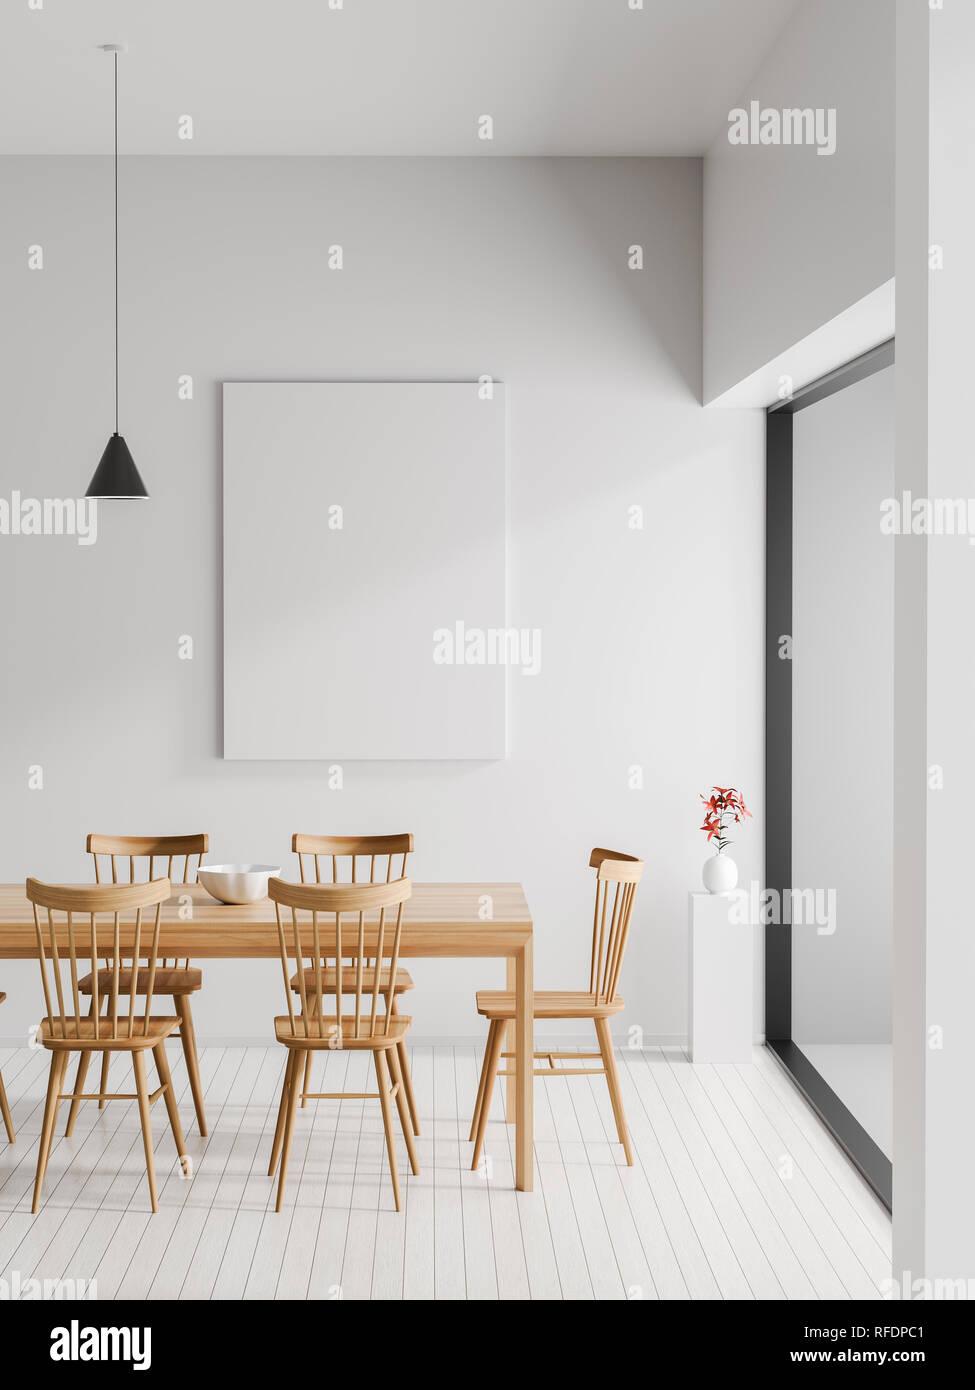 Maquetas fotograma póster en estilo Escandinavo hipster interior ...